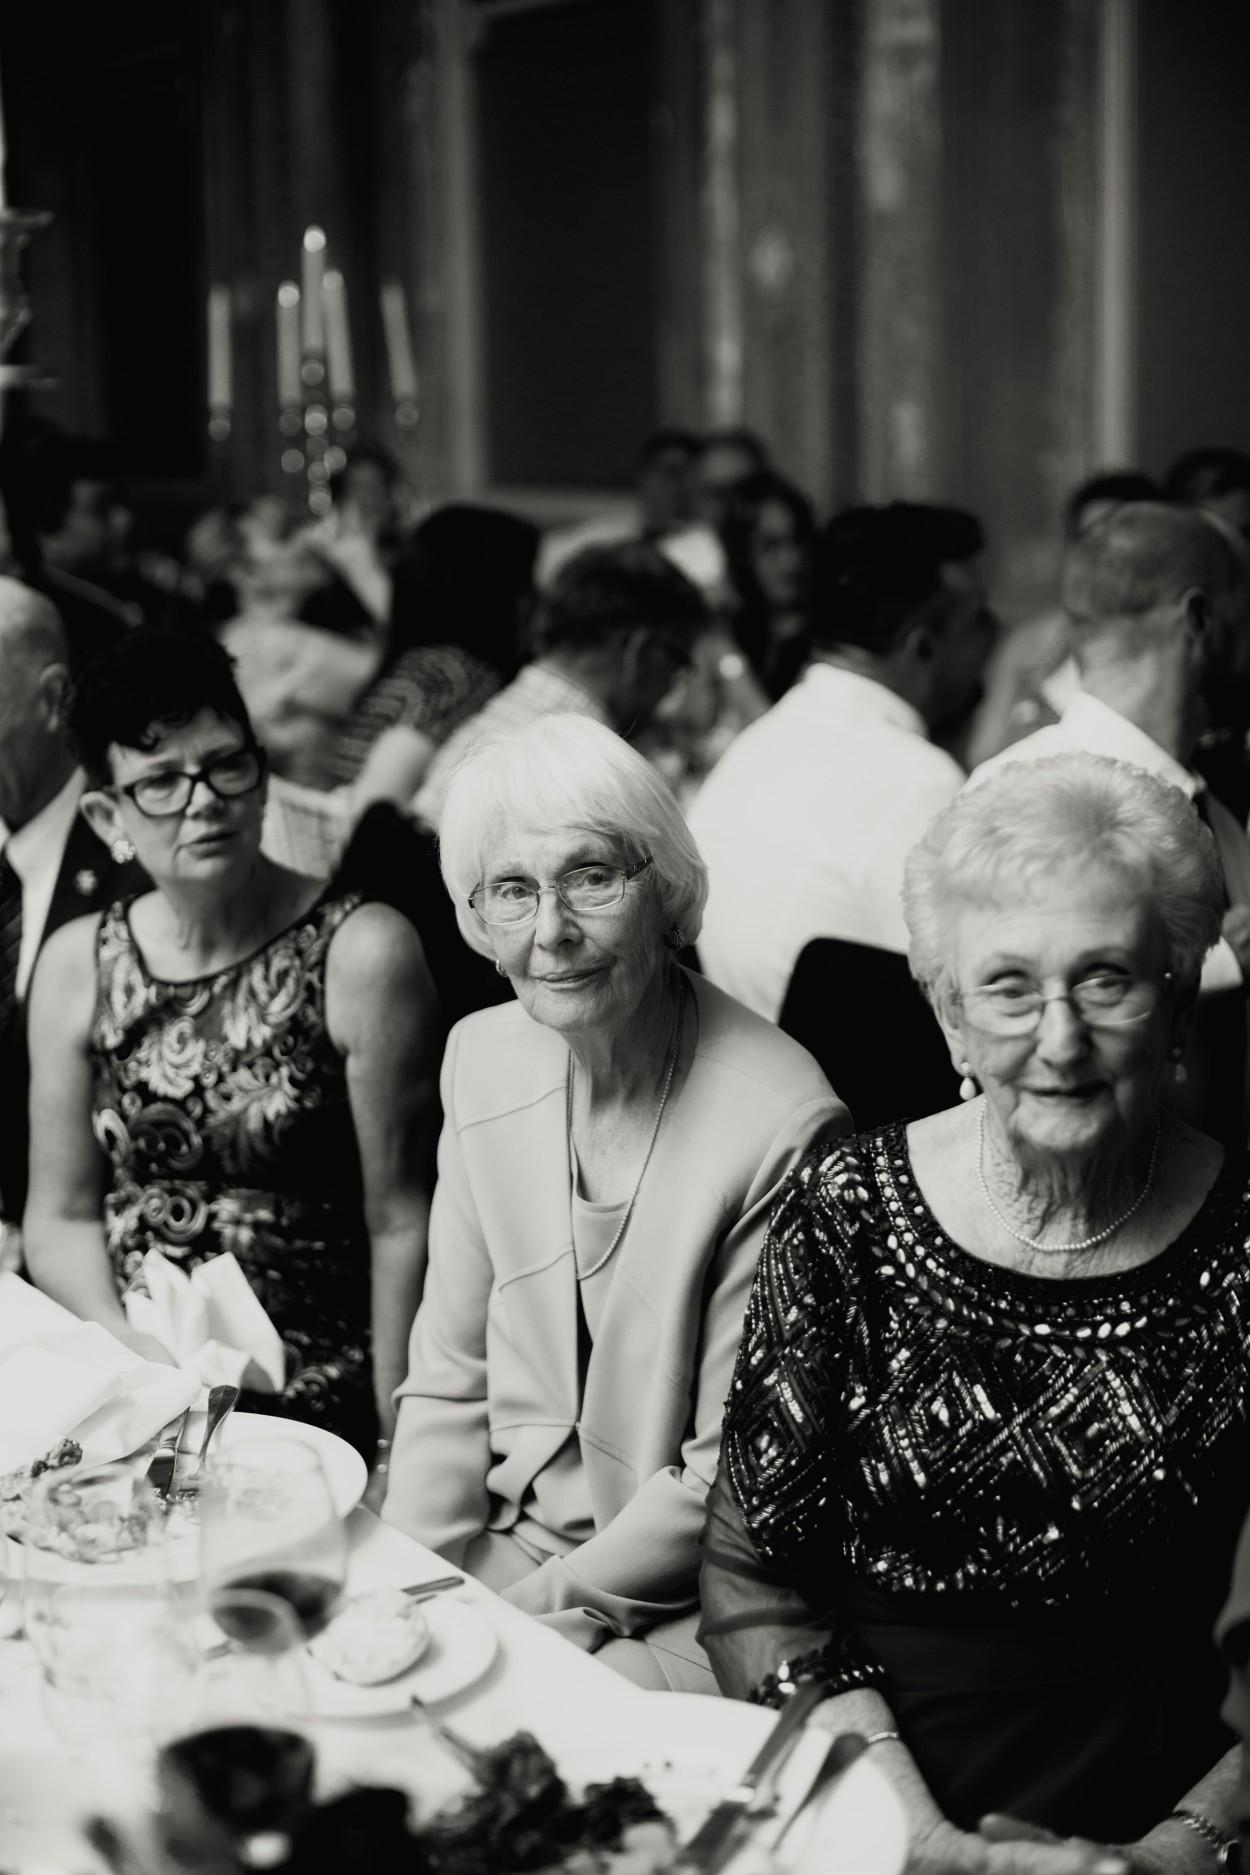 I-Got-You-Babe-Weddings-The-122George-Ballroom-St-Kilda-Wedding-Amy-Abhi.jpg